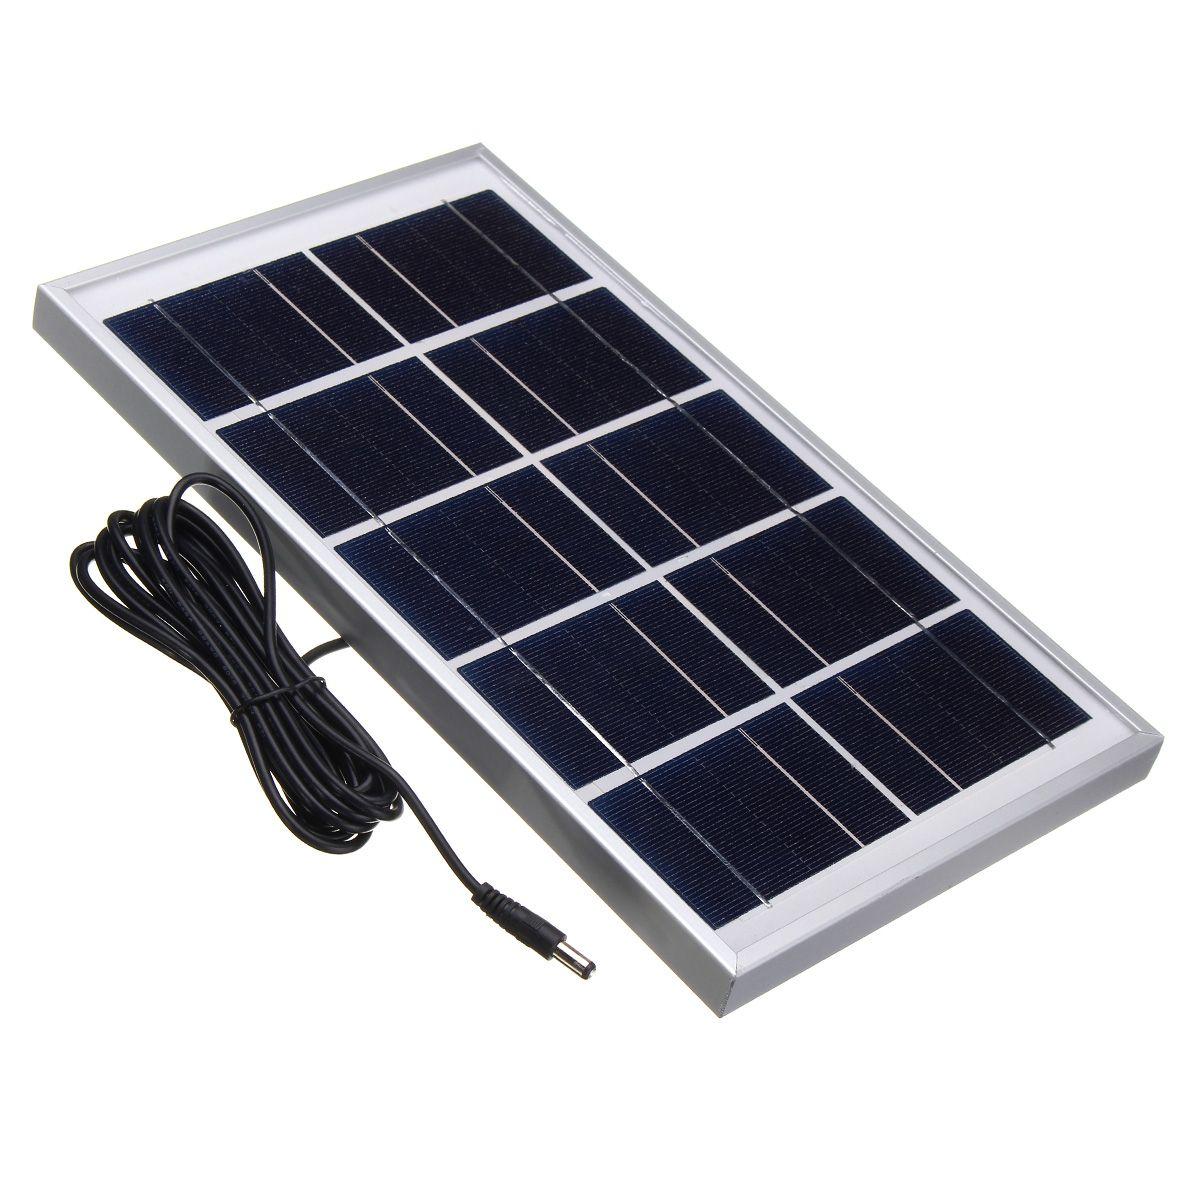 5v 7w Durdable Impermeable Polycrystalline Solar Cargador De Panel Con Cable 3m Para Luz De Emergencia Camping Compenentes Diy Kits From Electr A On Banggood Solar Panel Charger Solar Panels